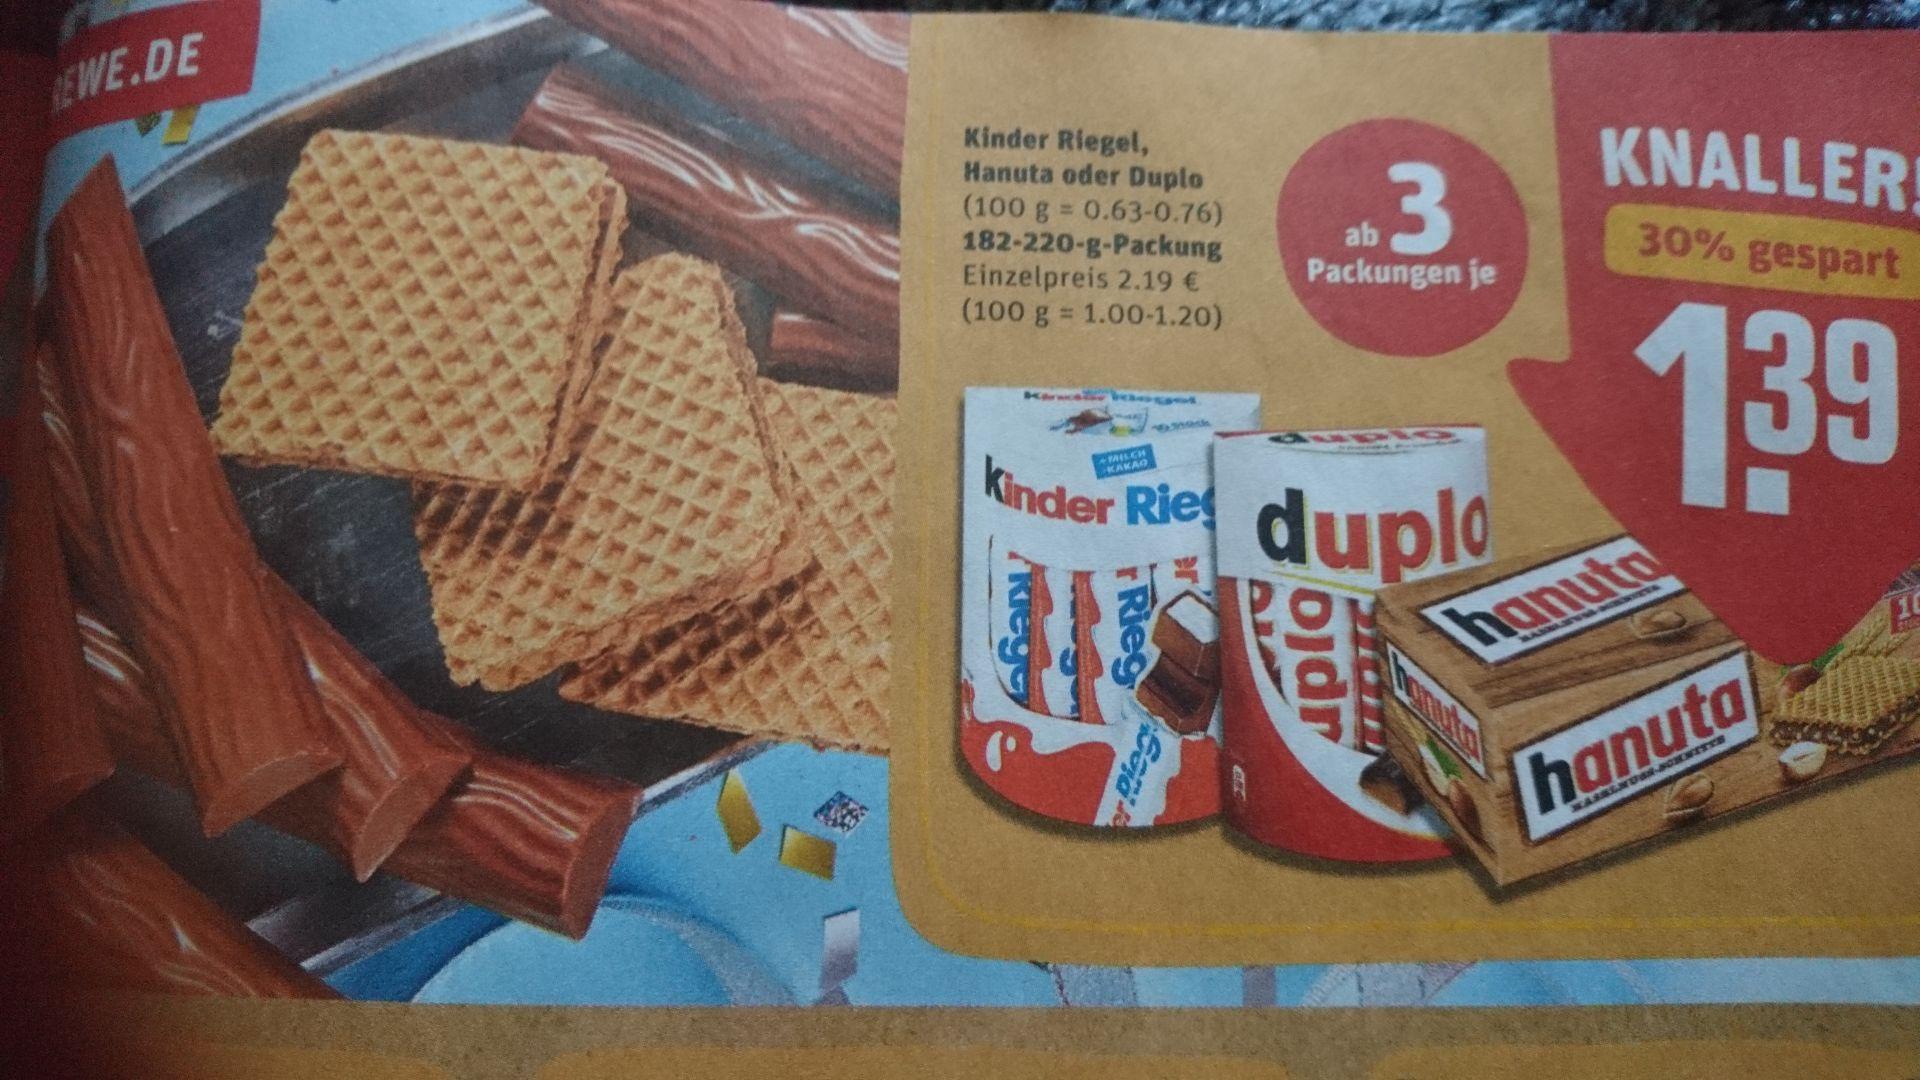 Rewe Duplo, Hanuta, Kinderriegel ab 3 Stück 1,39